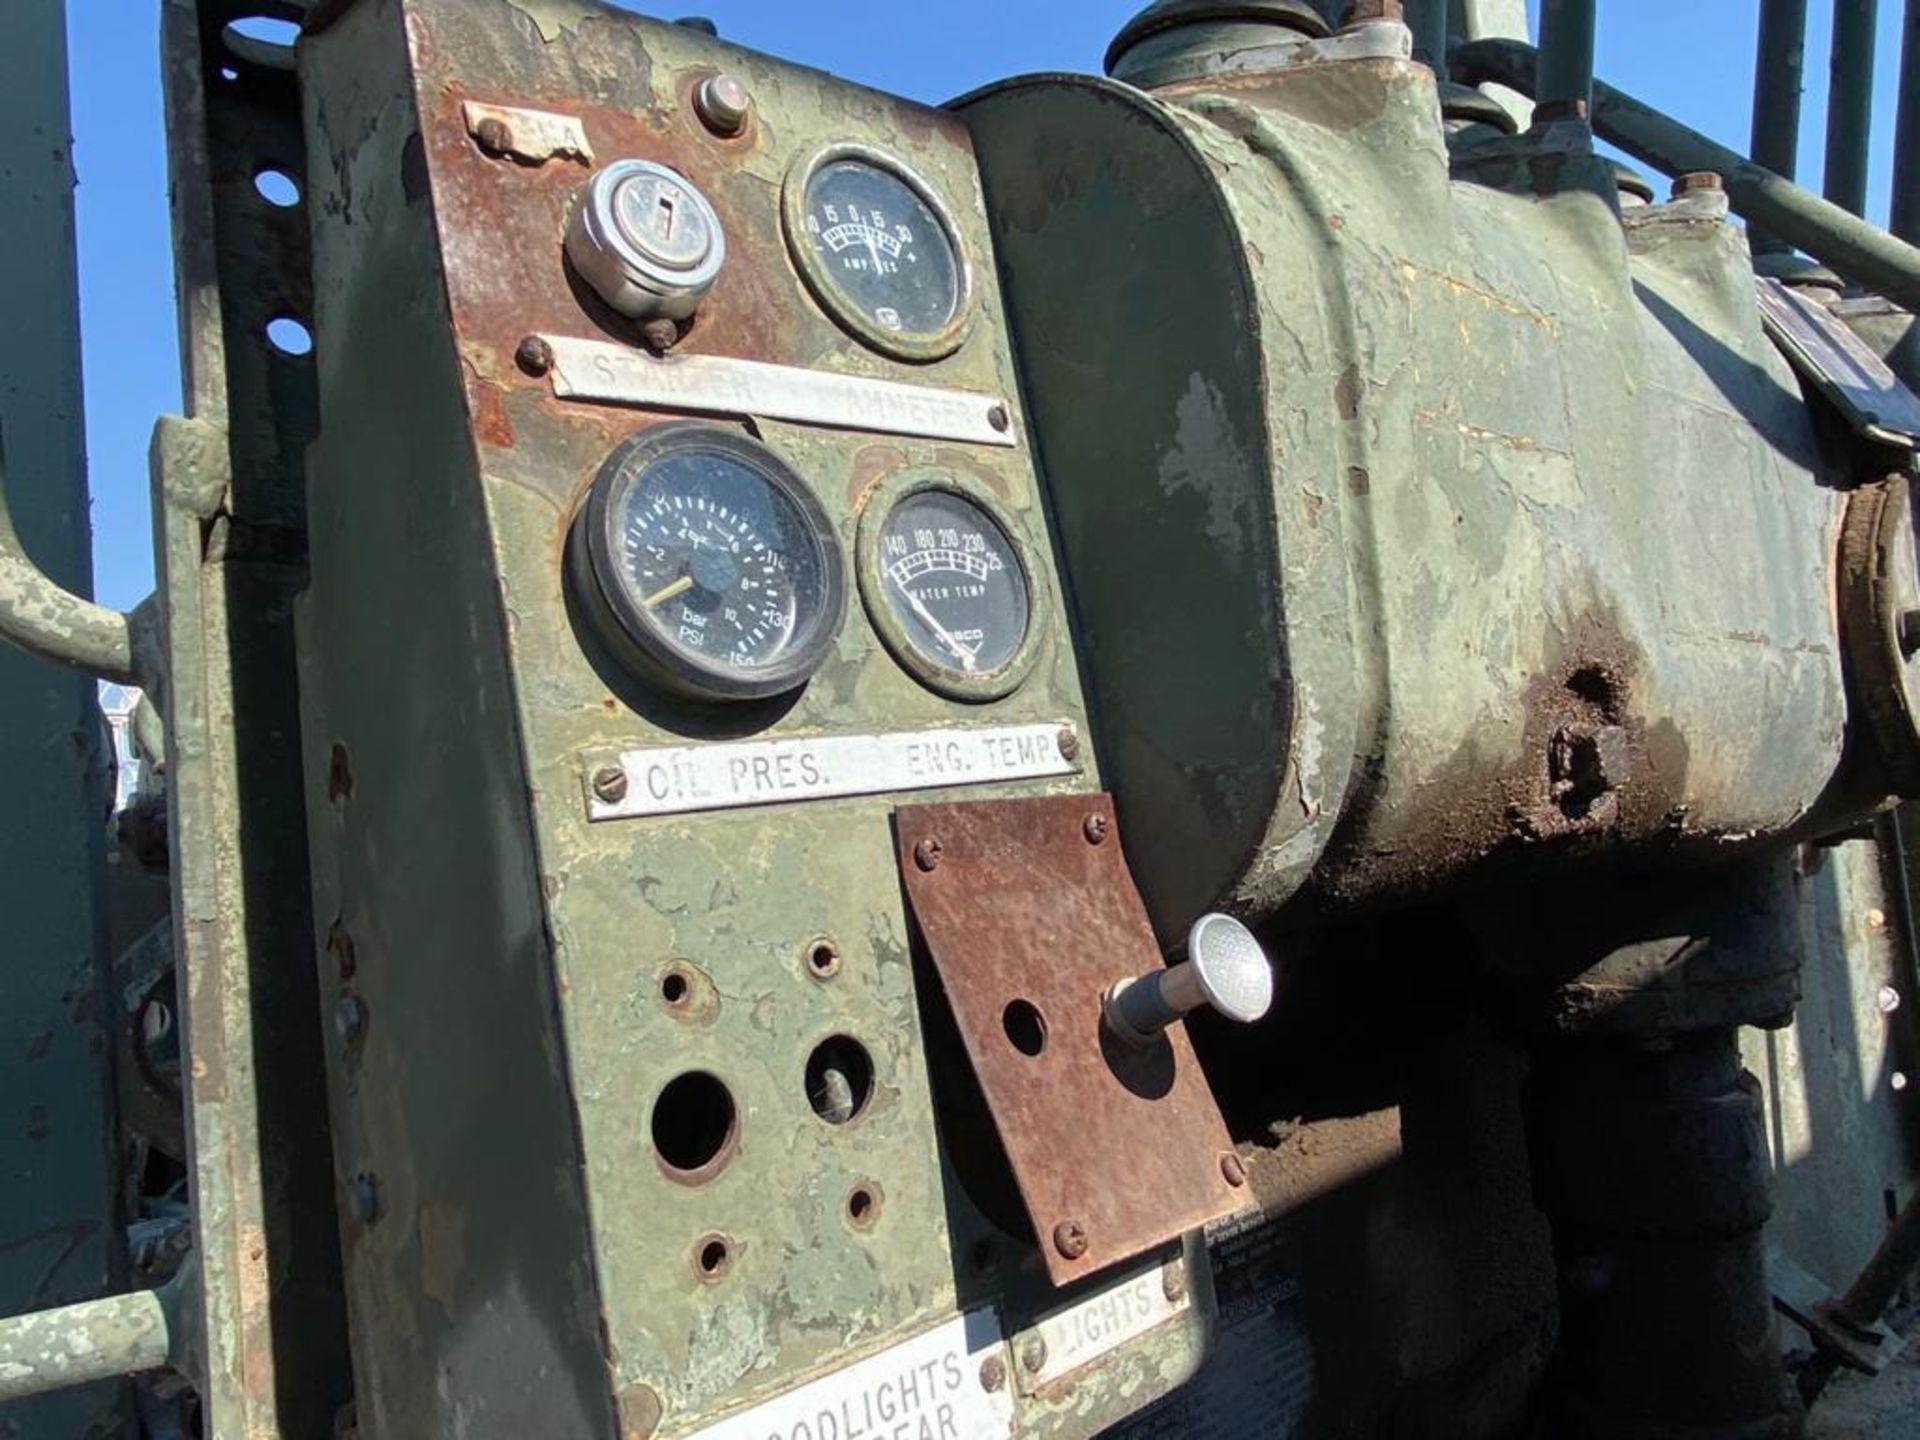 1970 Wabco4 440H Motor Grader, Serial number 440HAGM1398 - Image 57 of 77